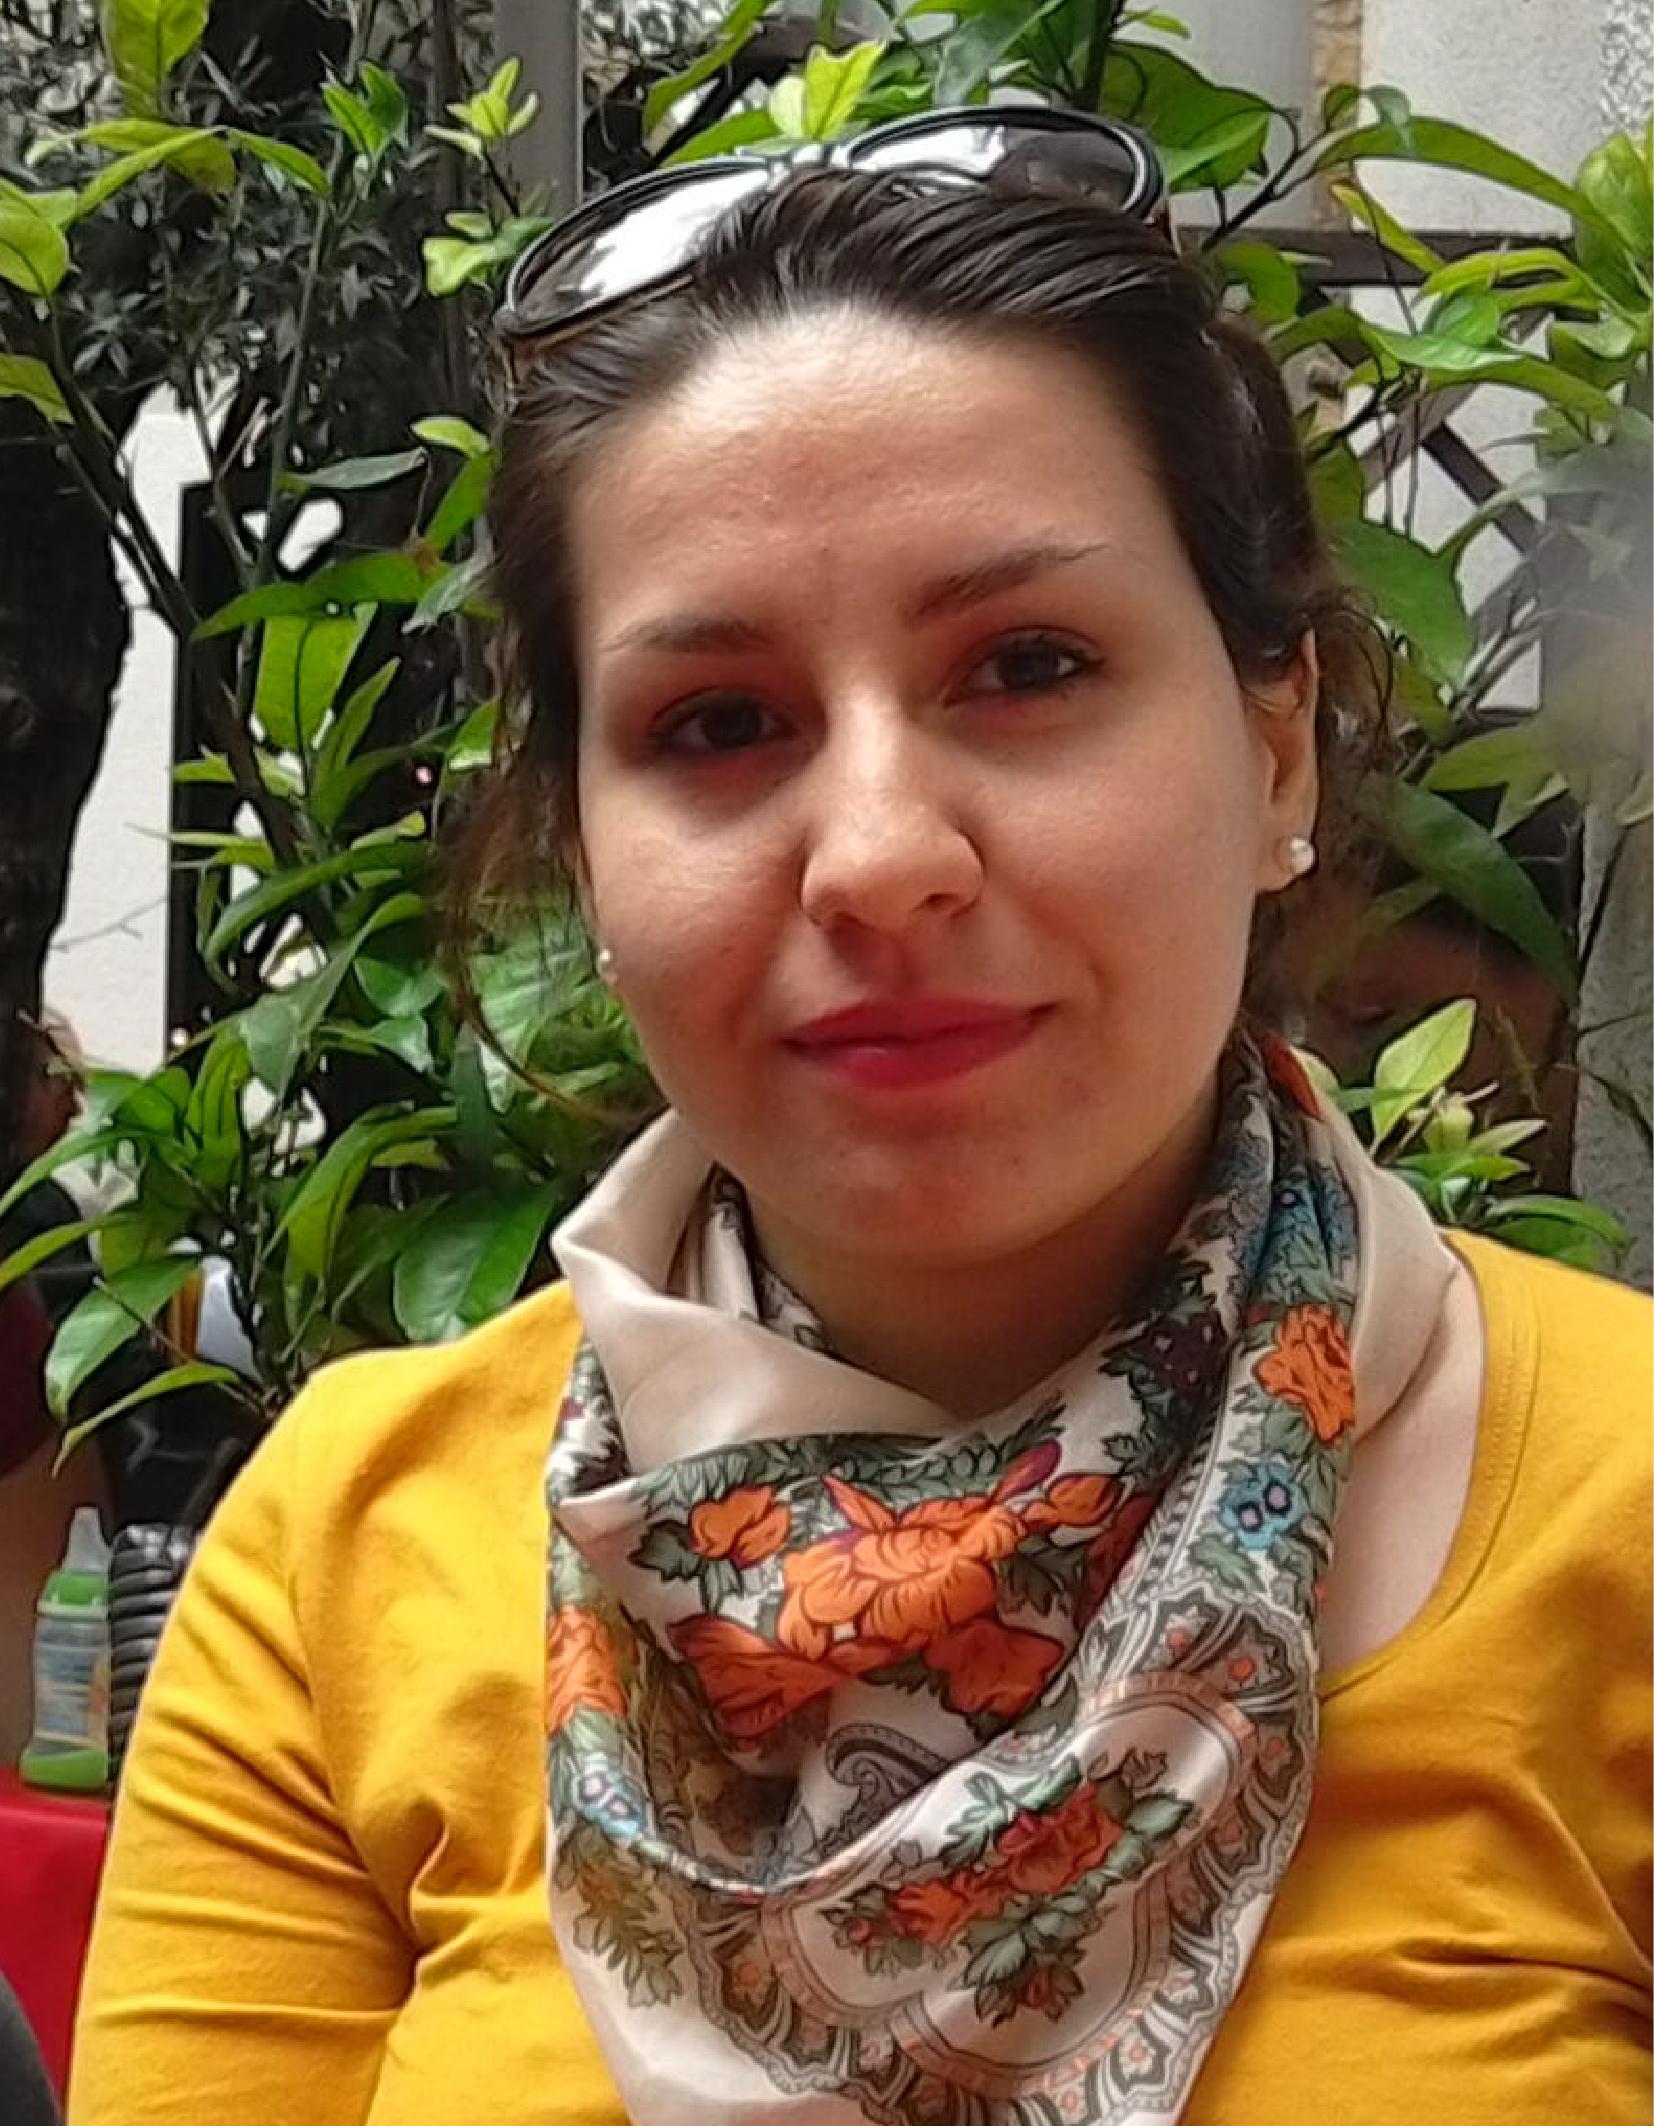 Reyhaneh Ghassimezadeh